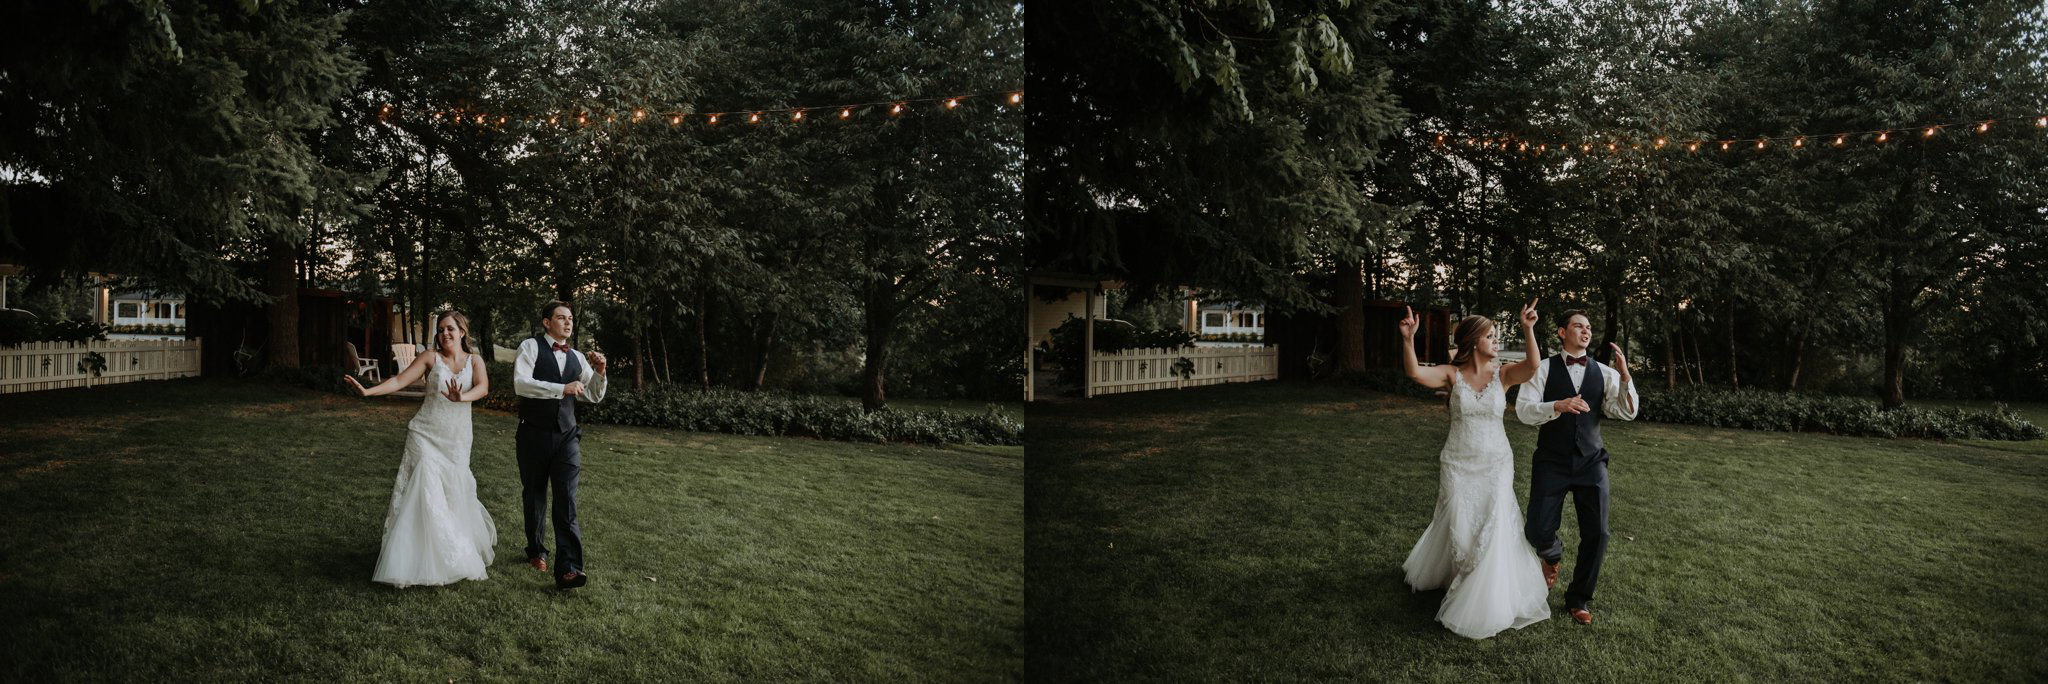 kristen-and-cody-the-kelley-farm-wedding-seattle-photographer-caitlyn-nikula-98.jpg